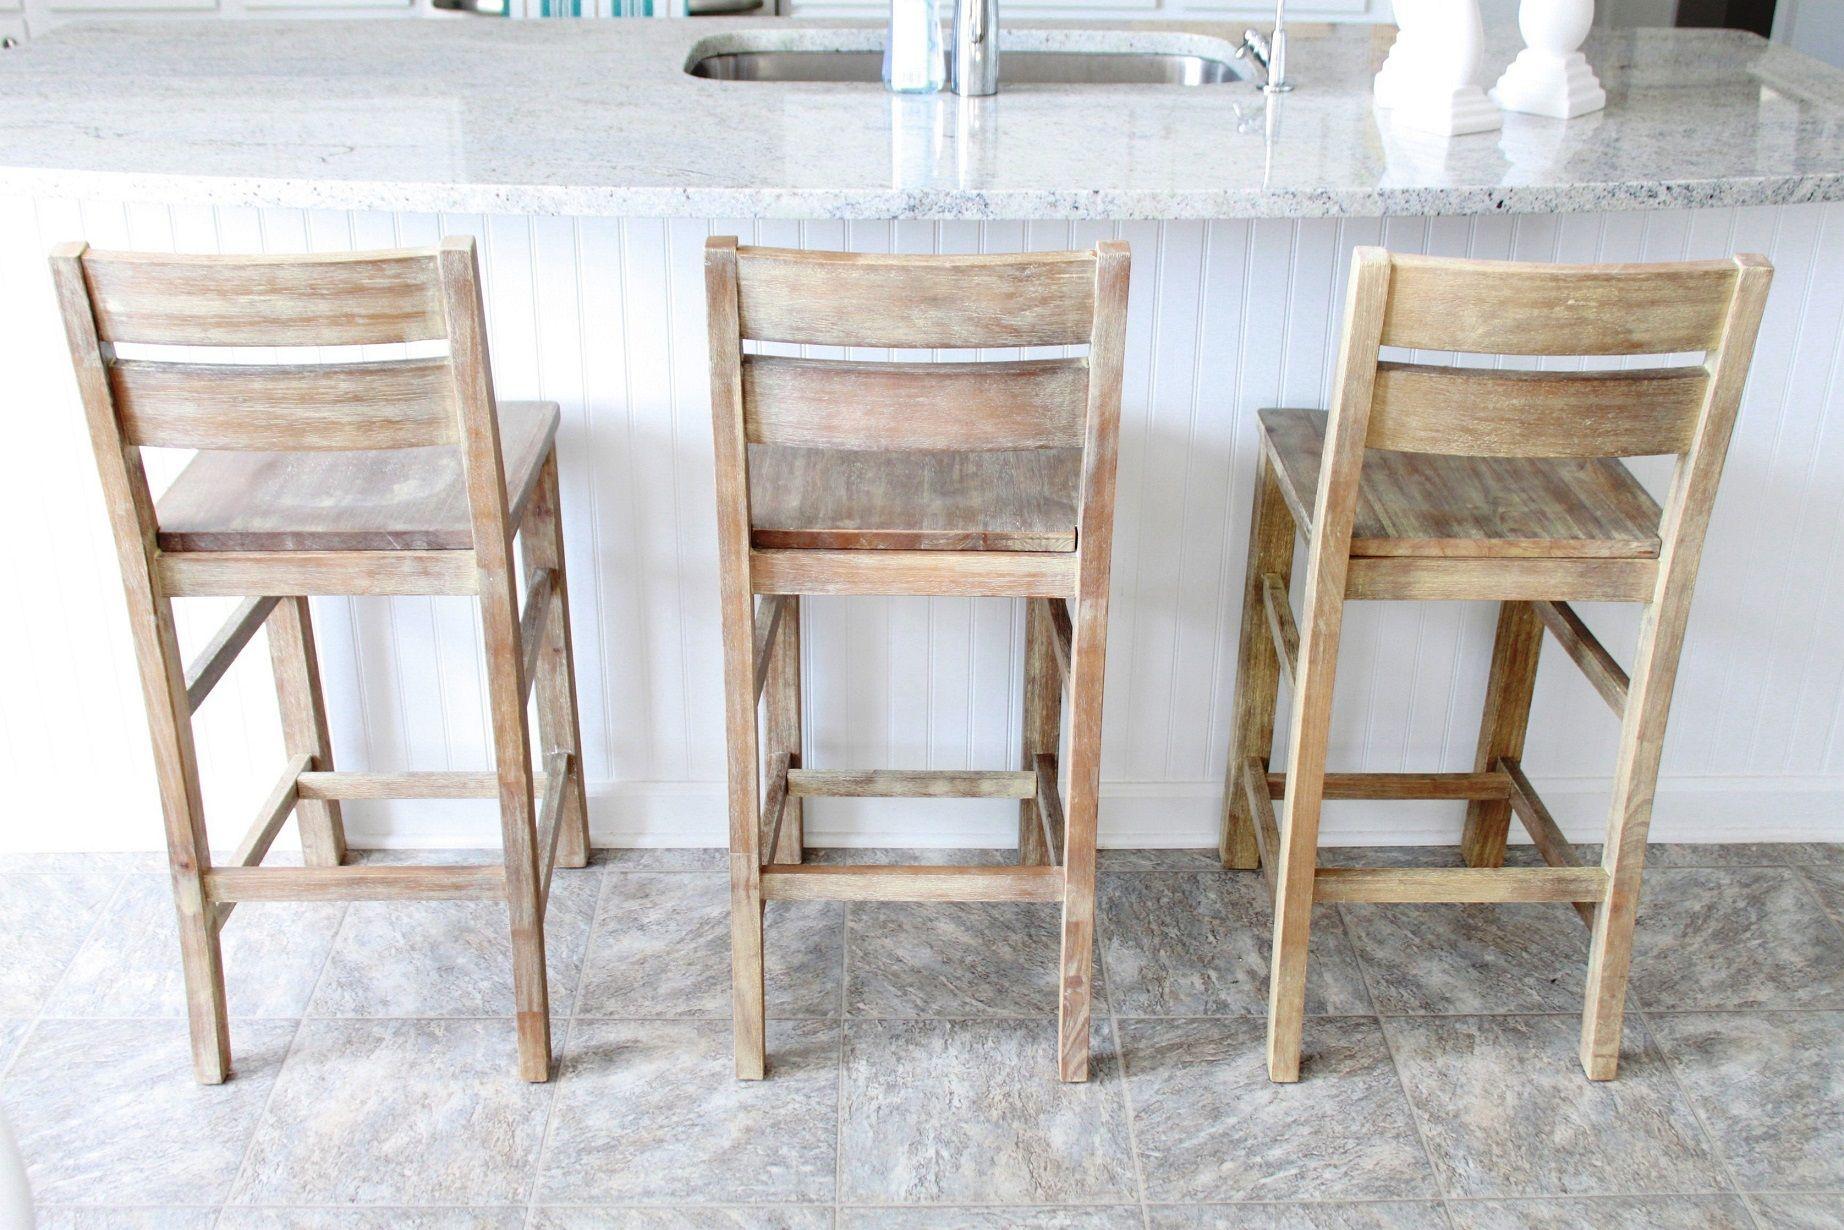 DIY Bar Stools With Backs Ideas Build Your Own Bar Stools13